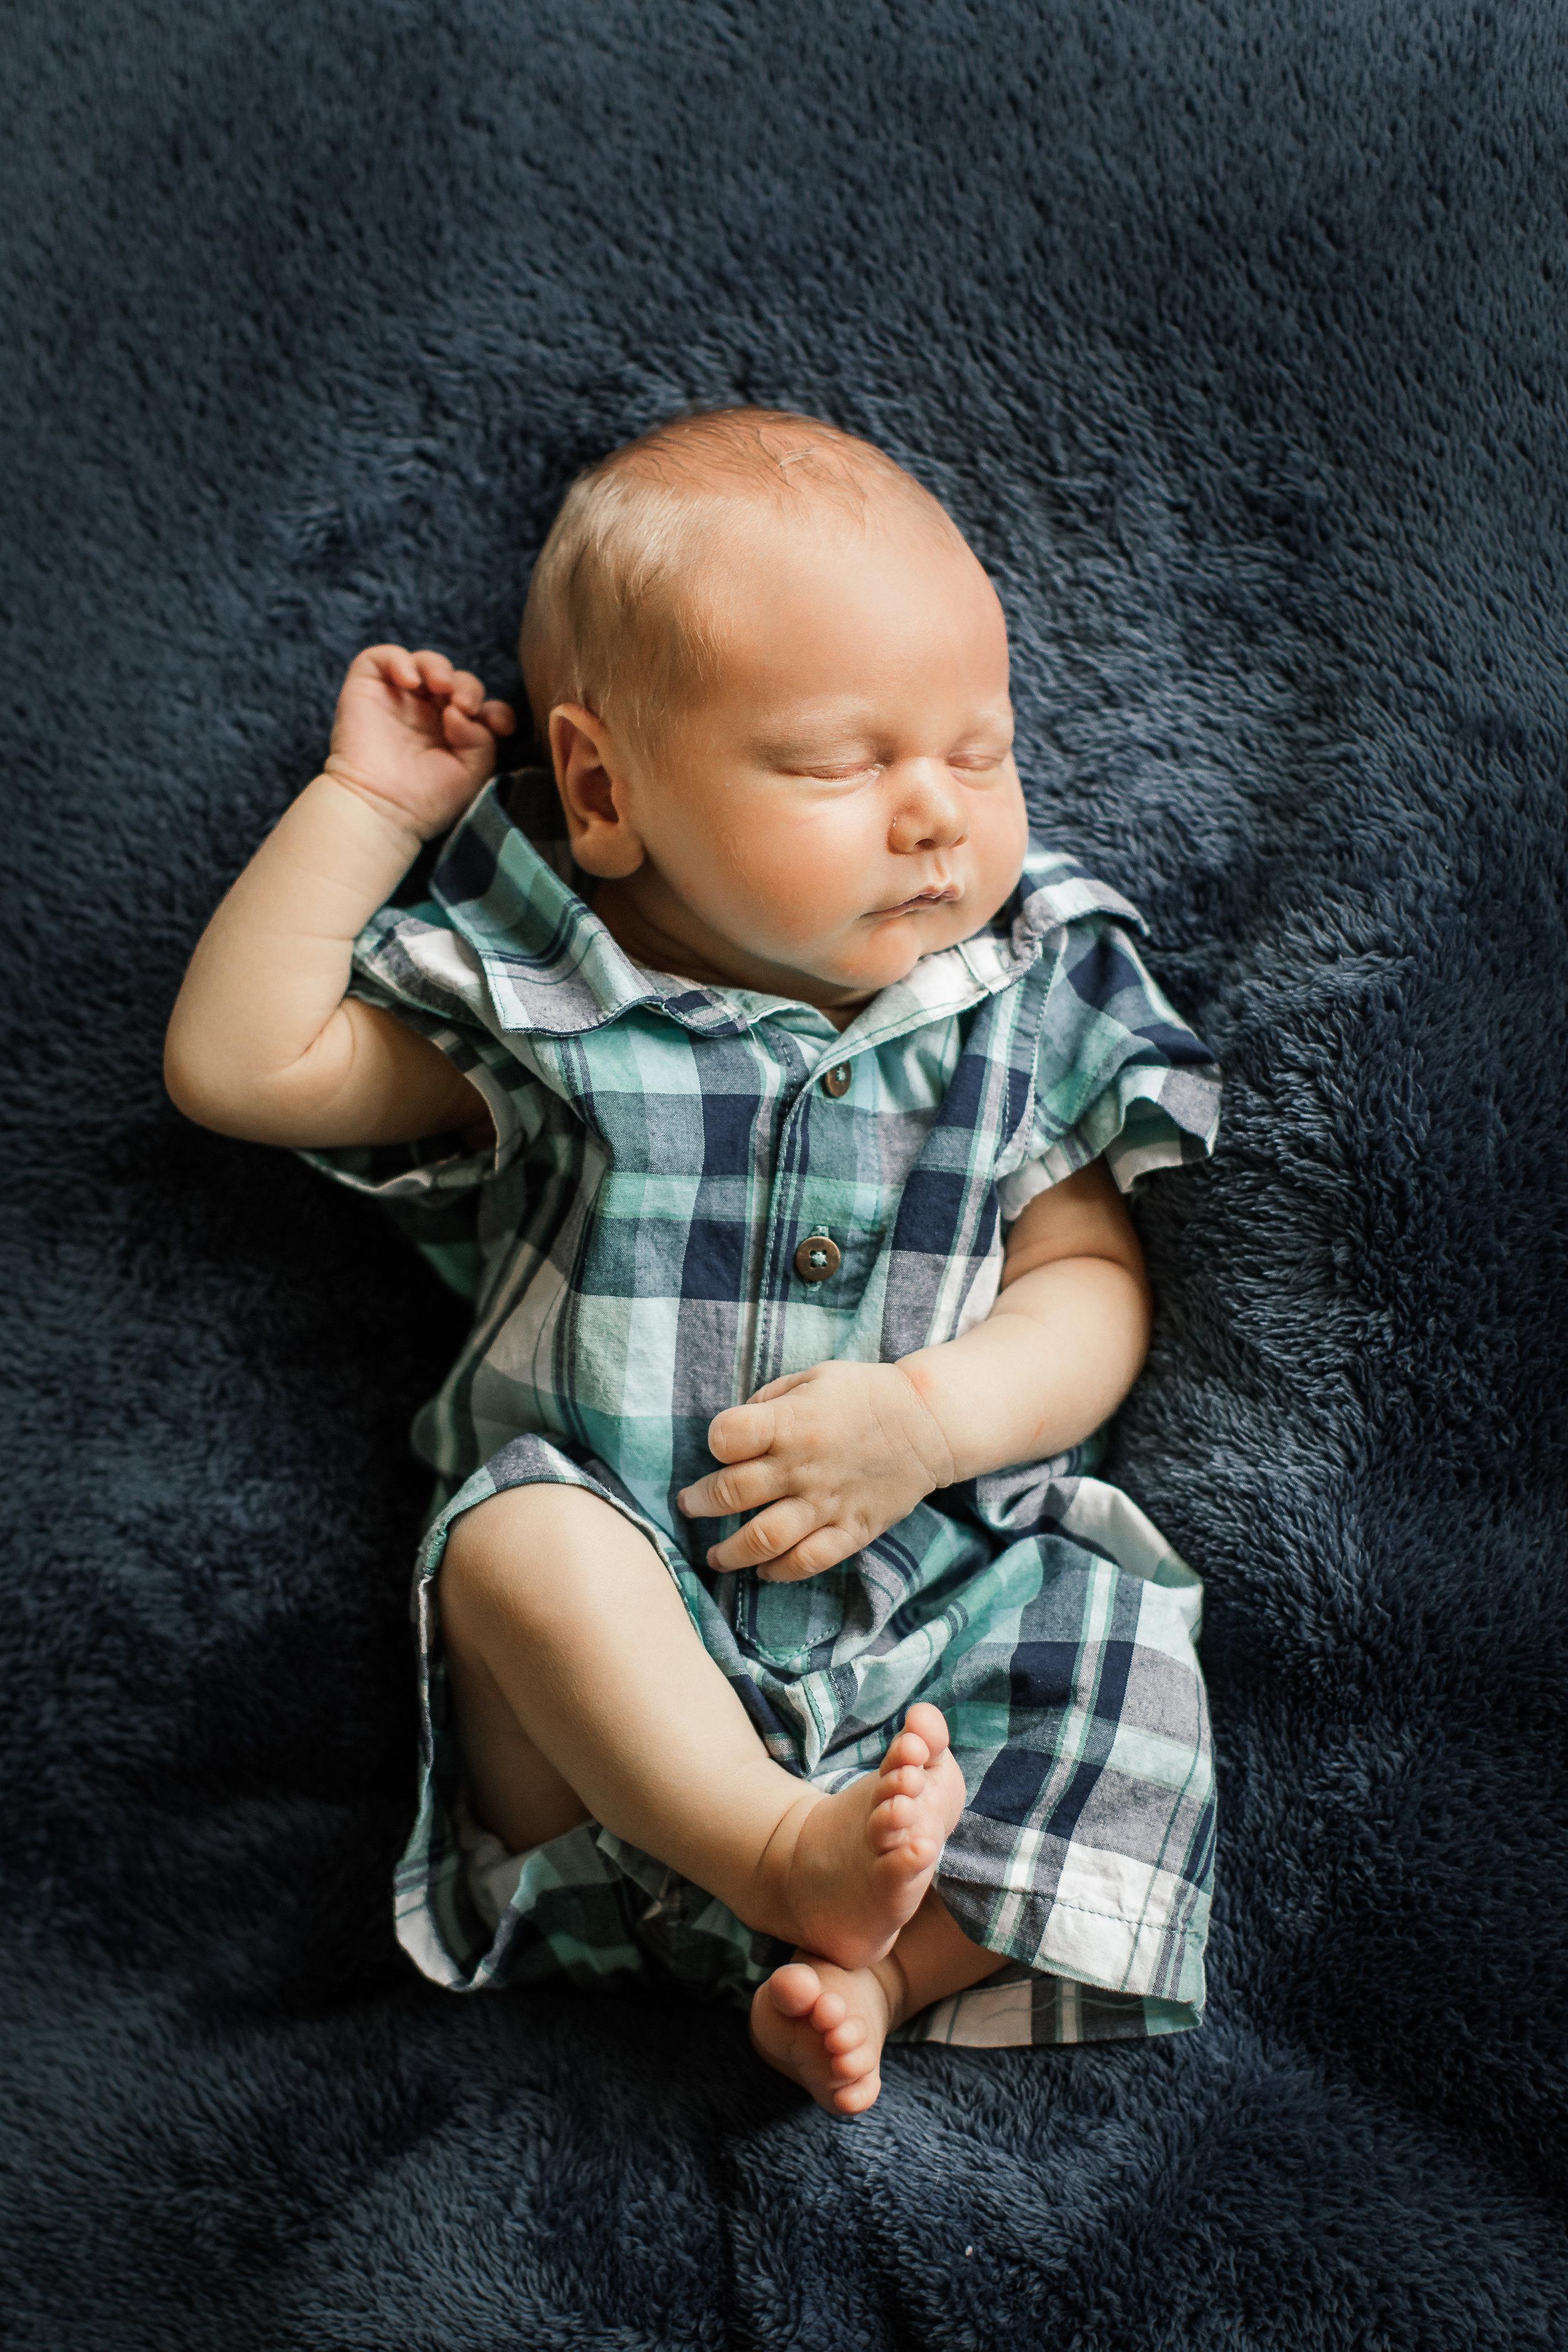 Newborn-Portraits-Rochester-MN-080-5DM43421.jpg